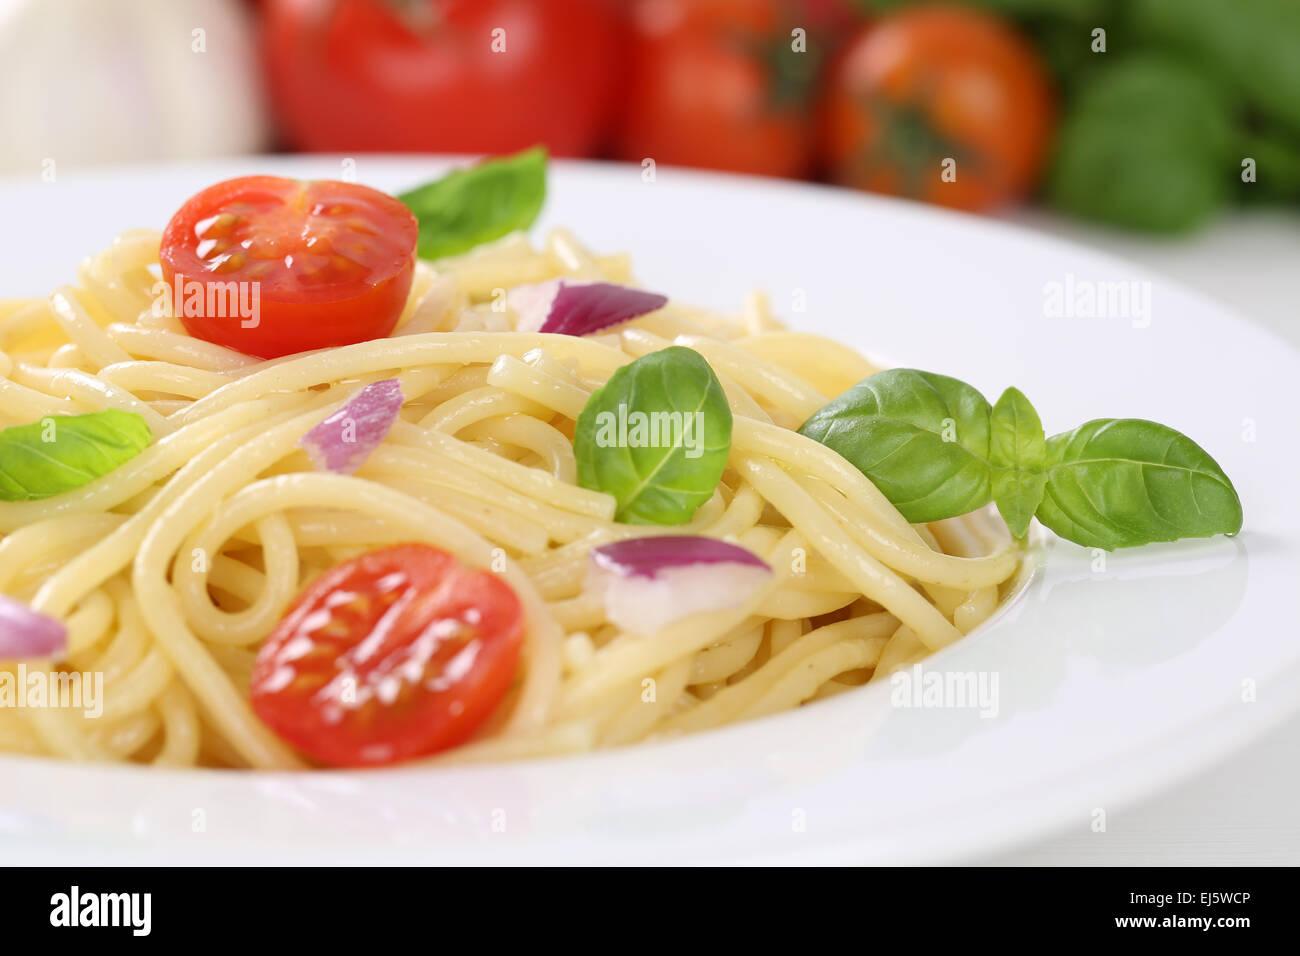 Repas alimentaire pâtes spaghettis aux tomates et basilic on plate Photo Stock